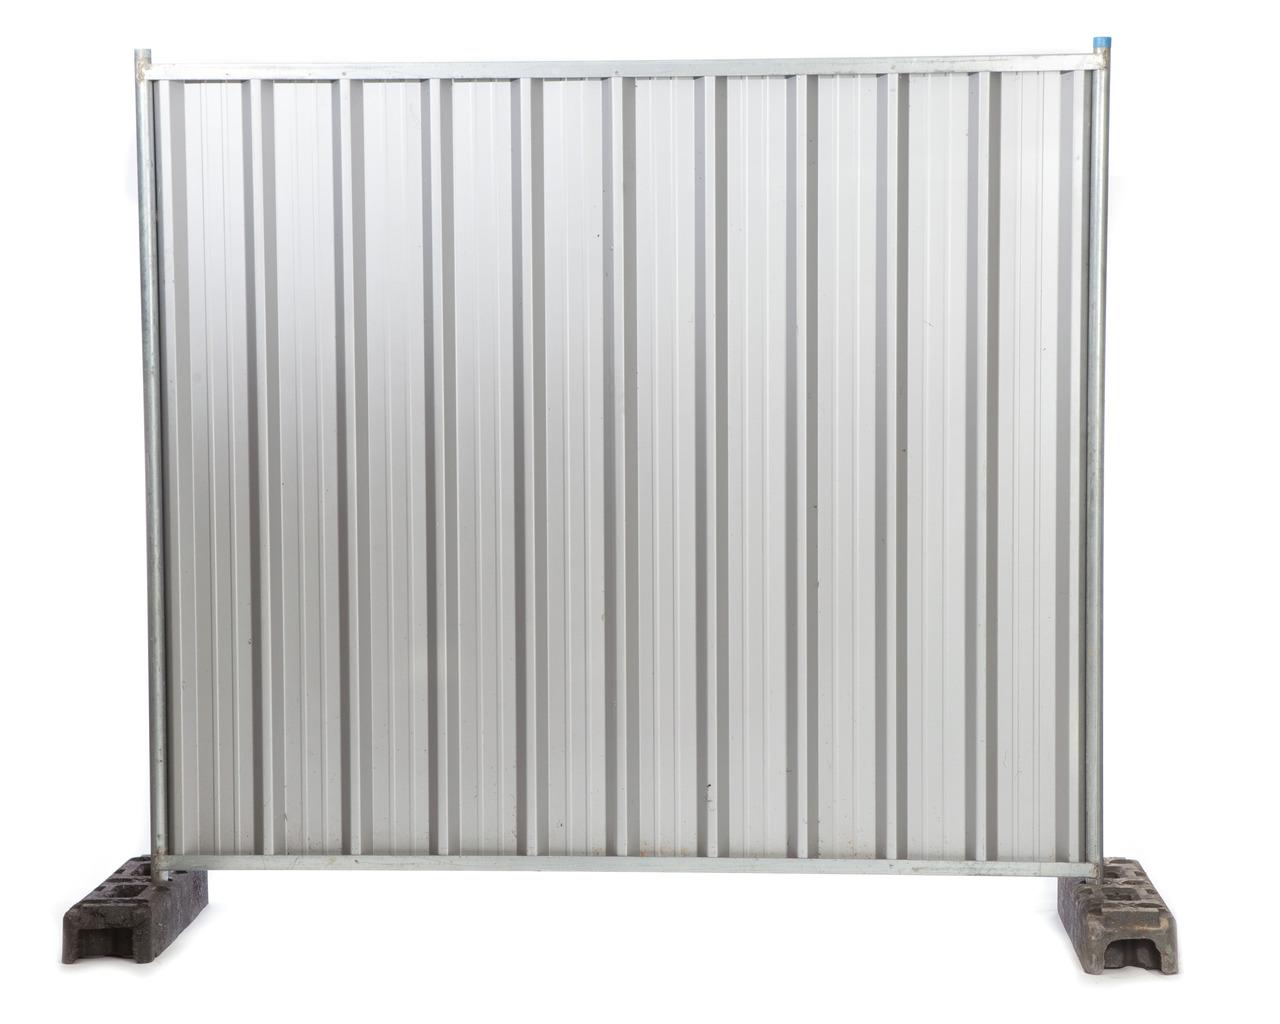 Steel fence supplier